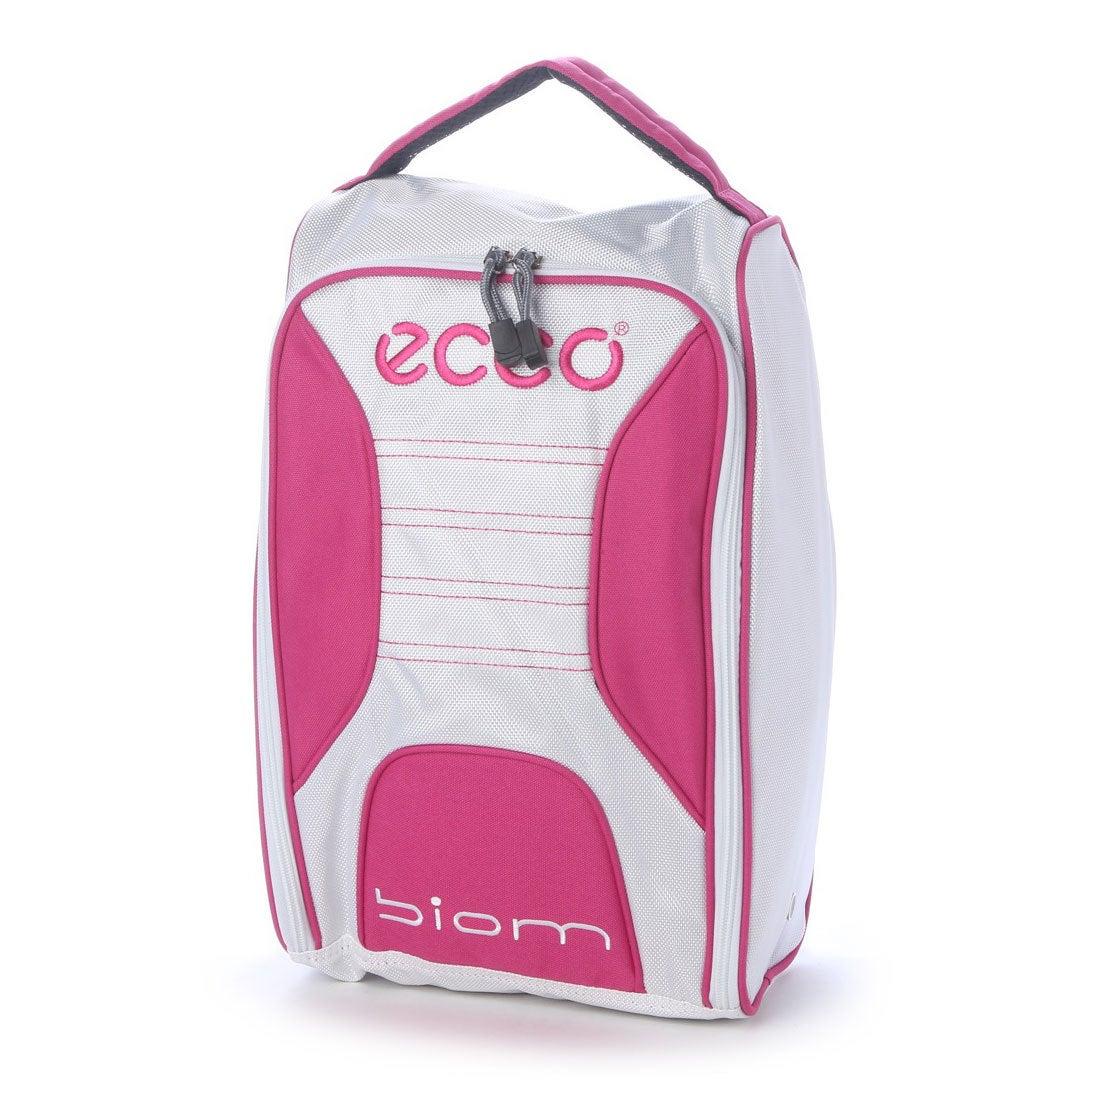 188e38be26ed エコー ECCO ECCO Golf Shoebag (WHITE CANDY) -スポーツ&アウトドア通販 ロコンドスポーツ (LOCOSPO)